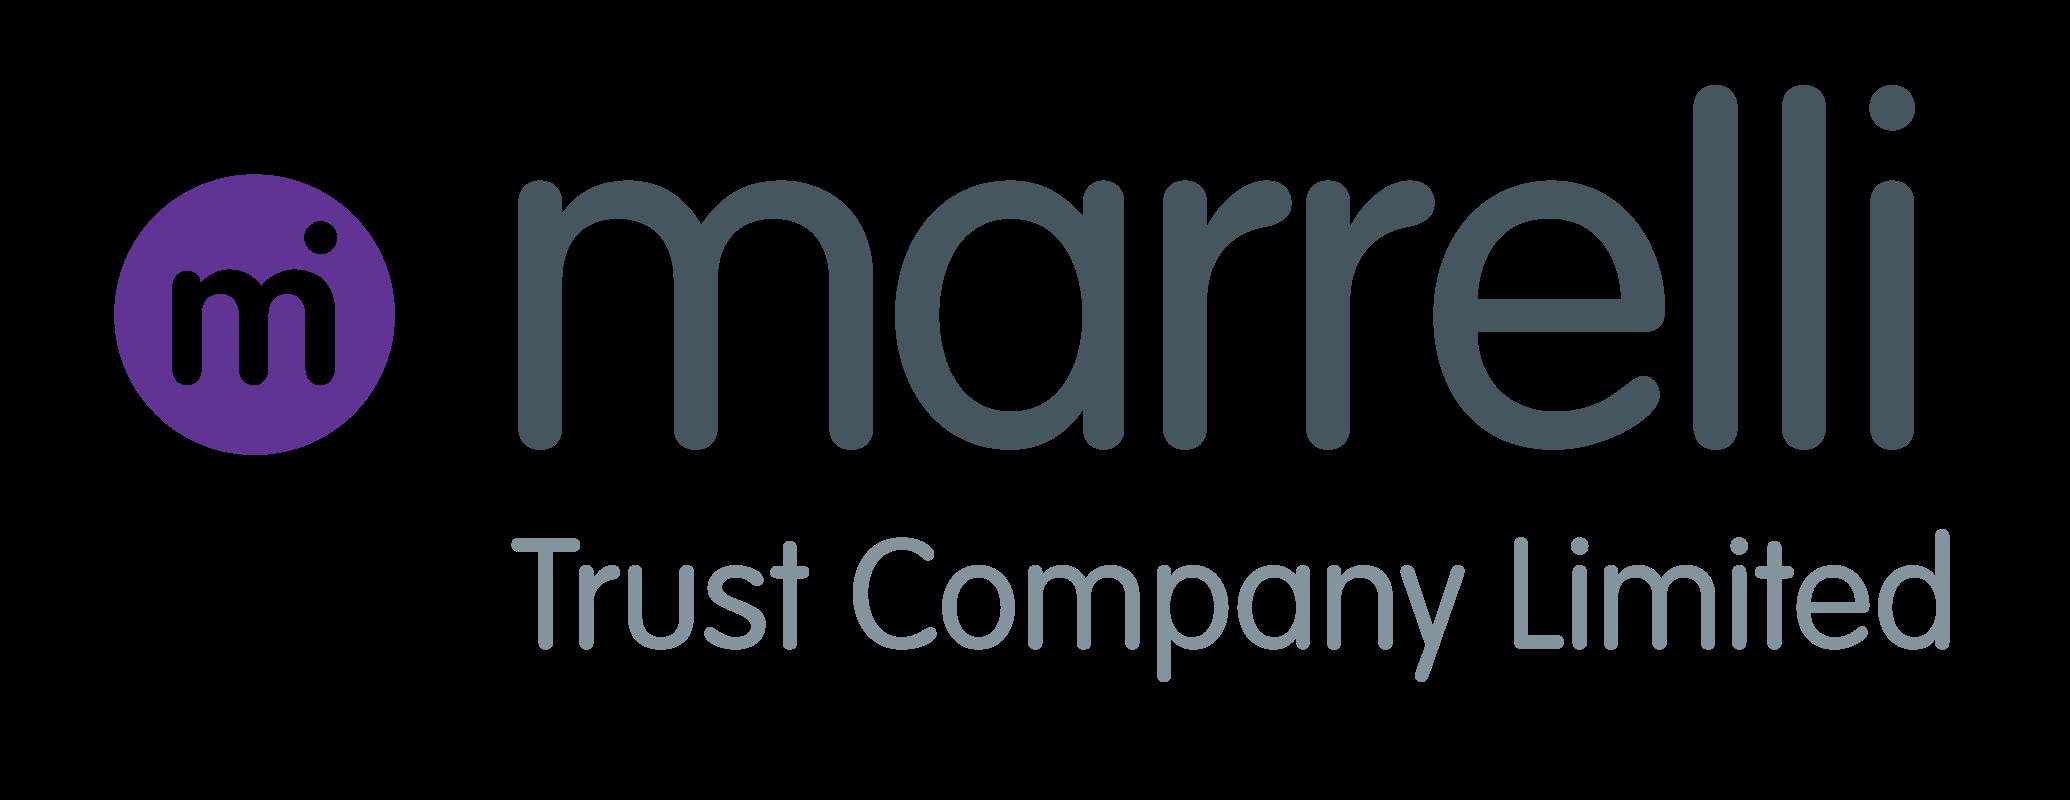 marrelli_Trust-Company-Ltd-CMYK.png